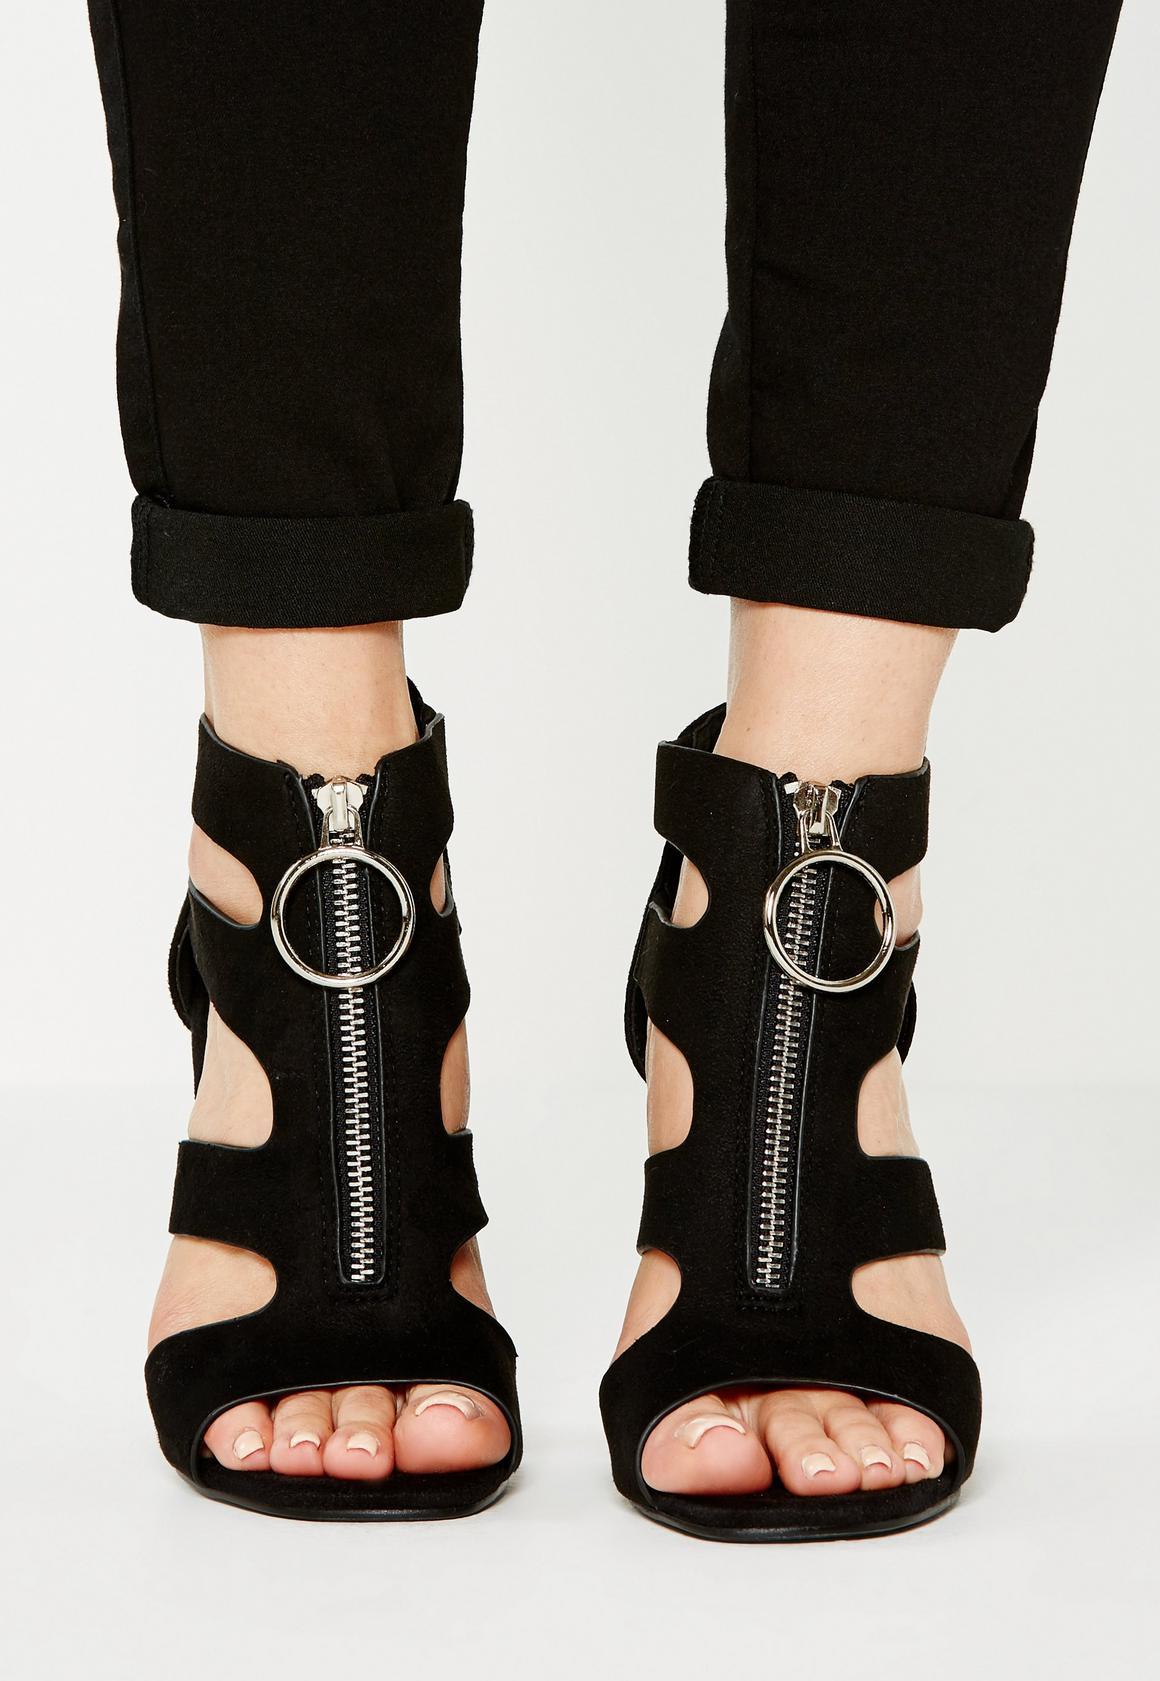 Black sandals grunge - Black Pull Ring Block Heel Sandals Black Pull Ring Block Heel Sandals